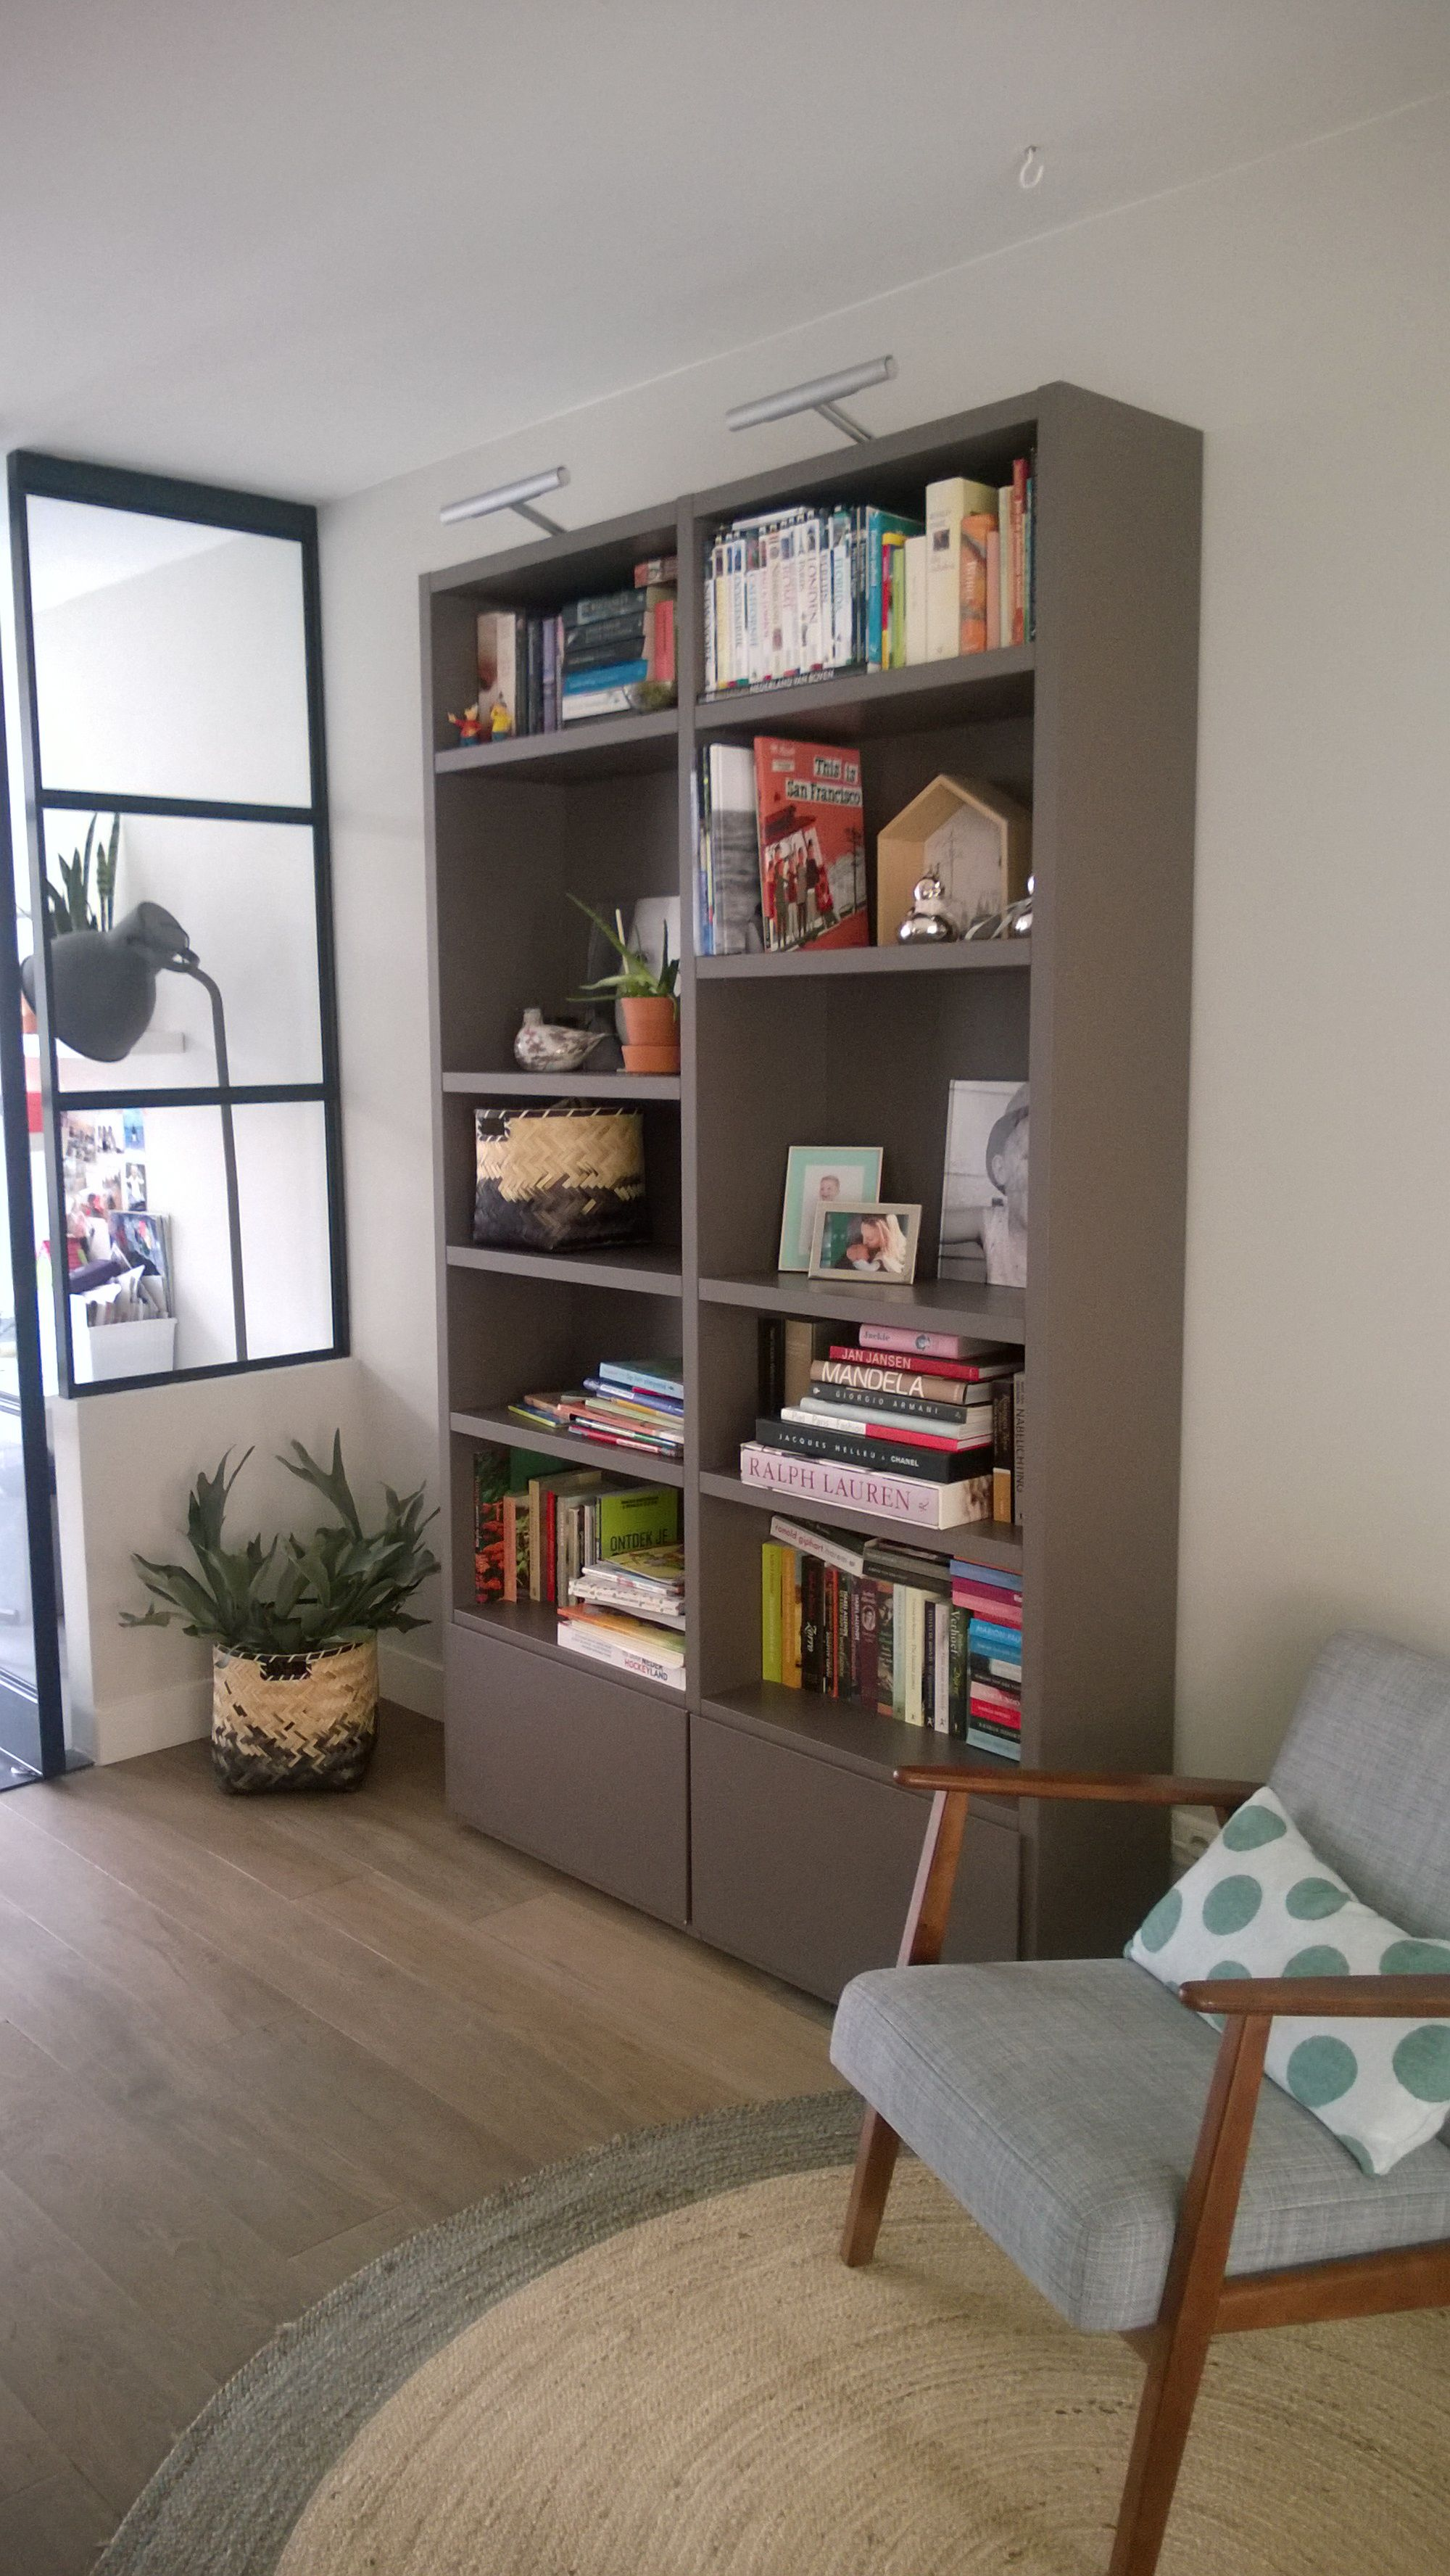 Poliform wall system, Boekenkast, Bookshelf, reading nook, stalen ...